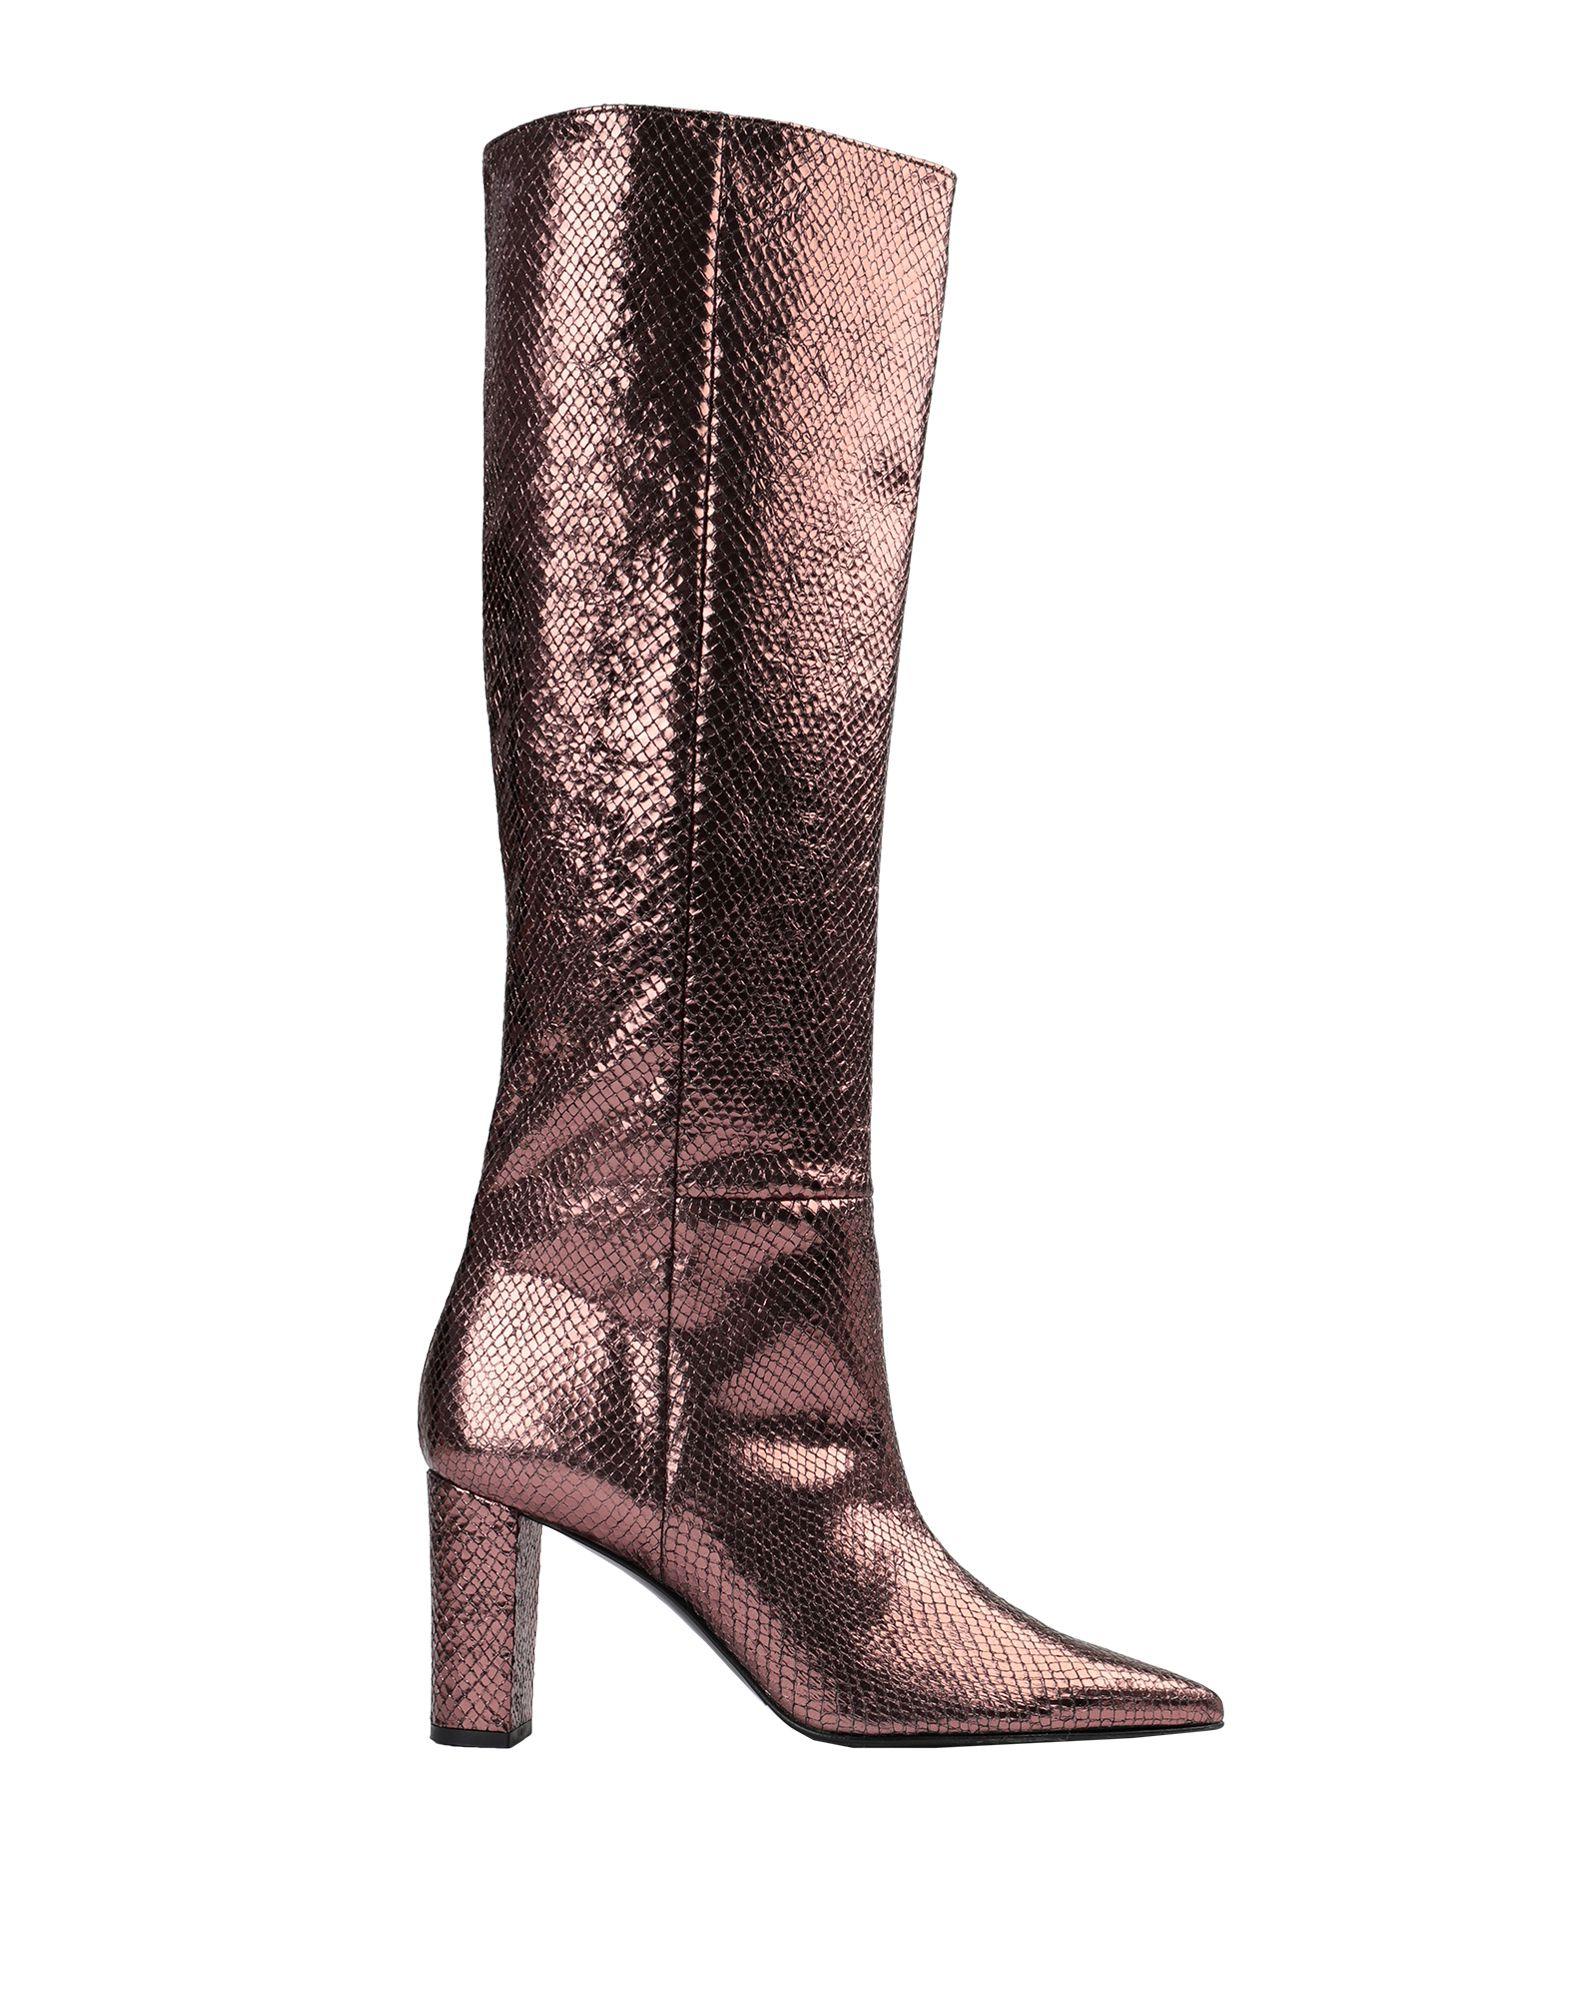 boots slack london сапоги короткие STEPHEN GOOD London Сапоги